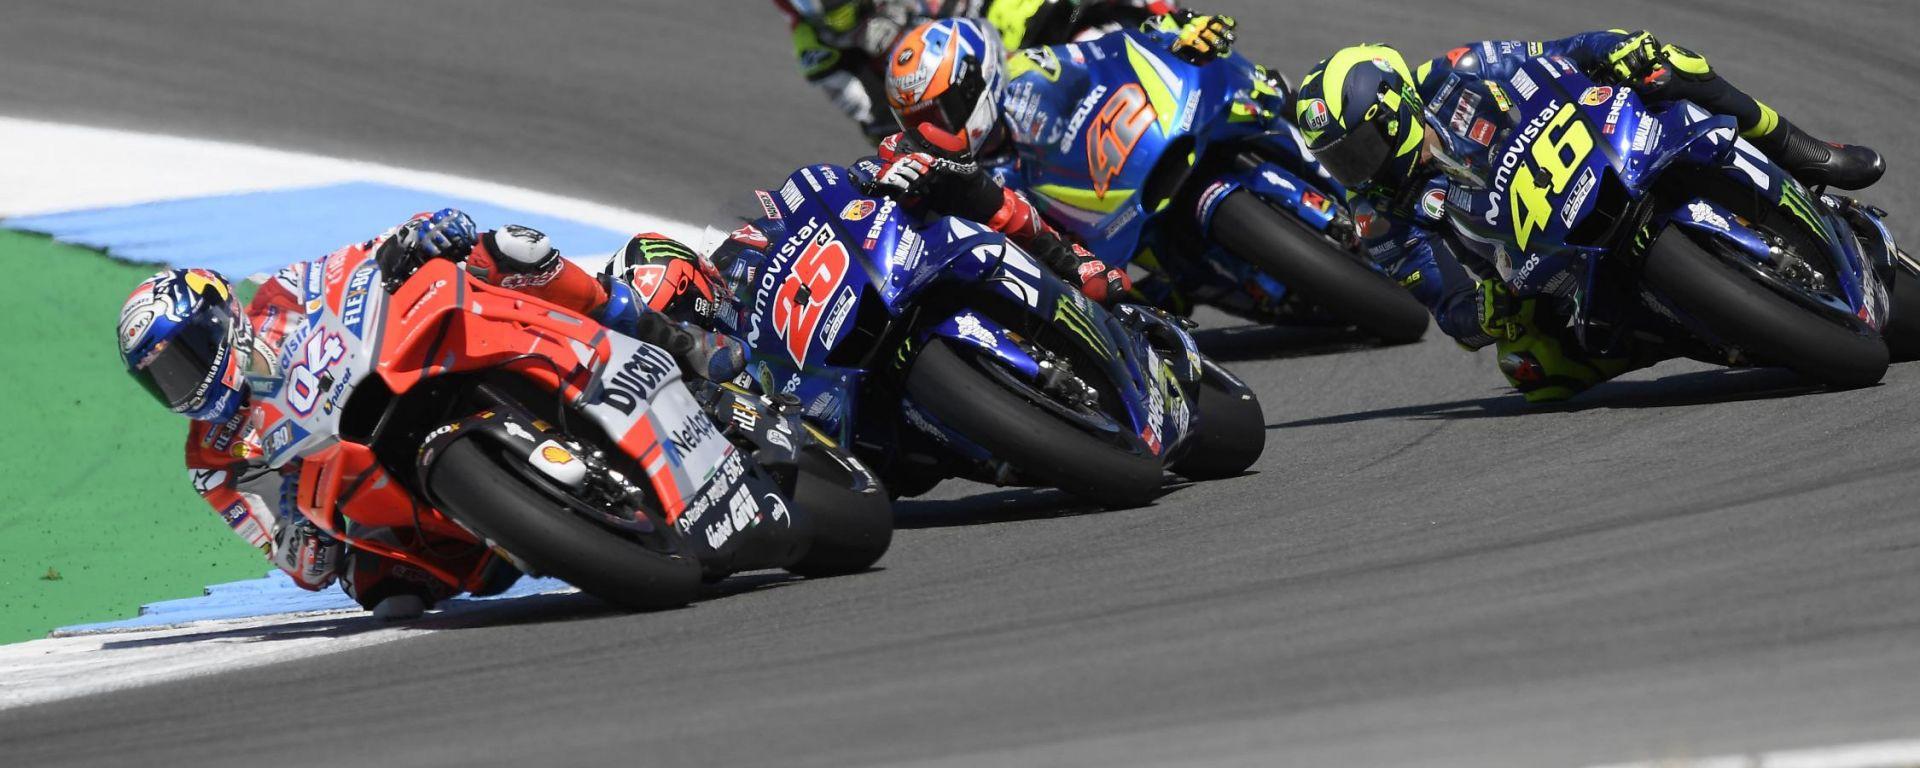 GP Olanda 2019, Assen, Dovizioso (Ducati), Vinales e Rossi (Yamaha), Rins (Suzuki), Crutchlow (Honda)